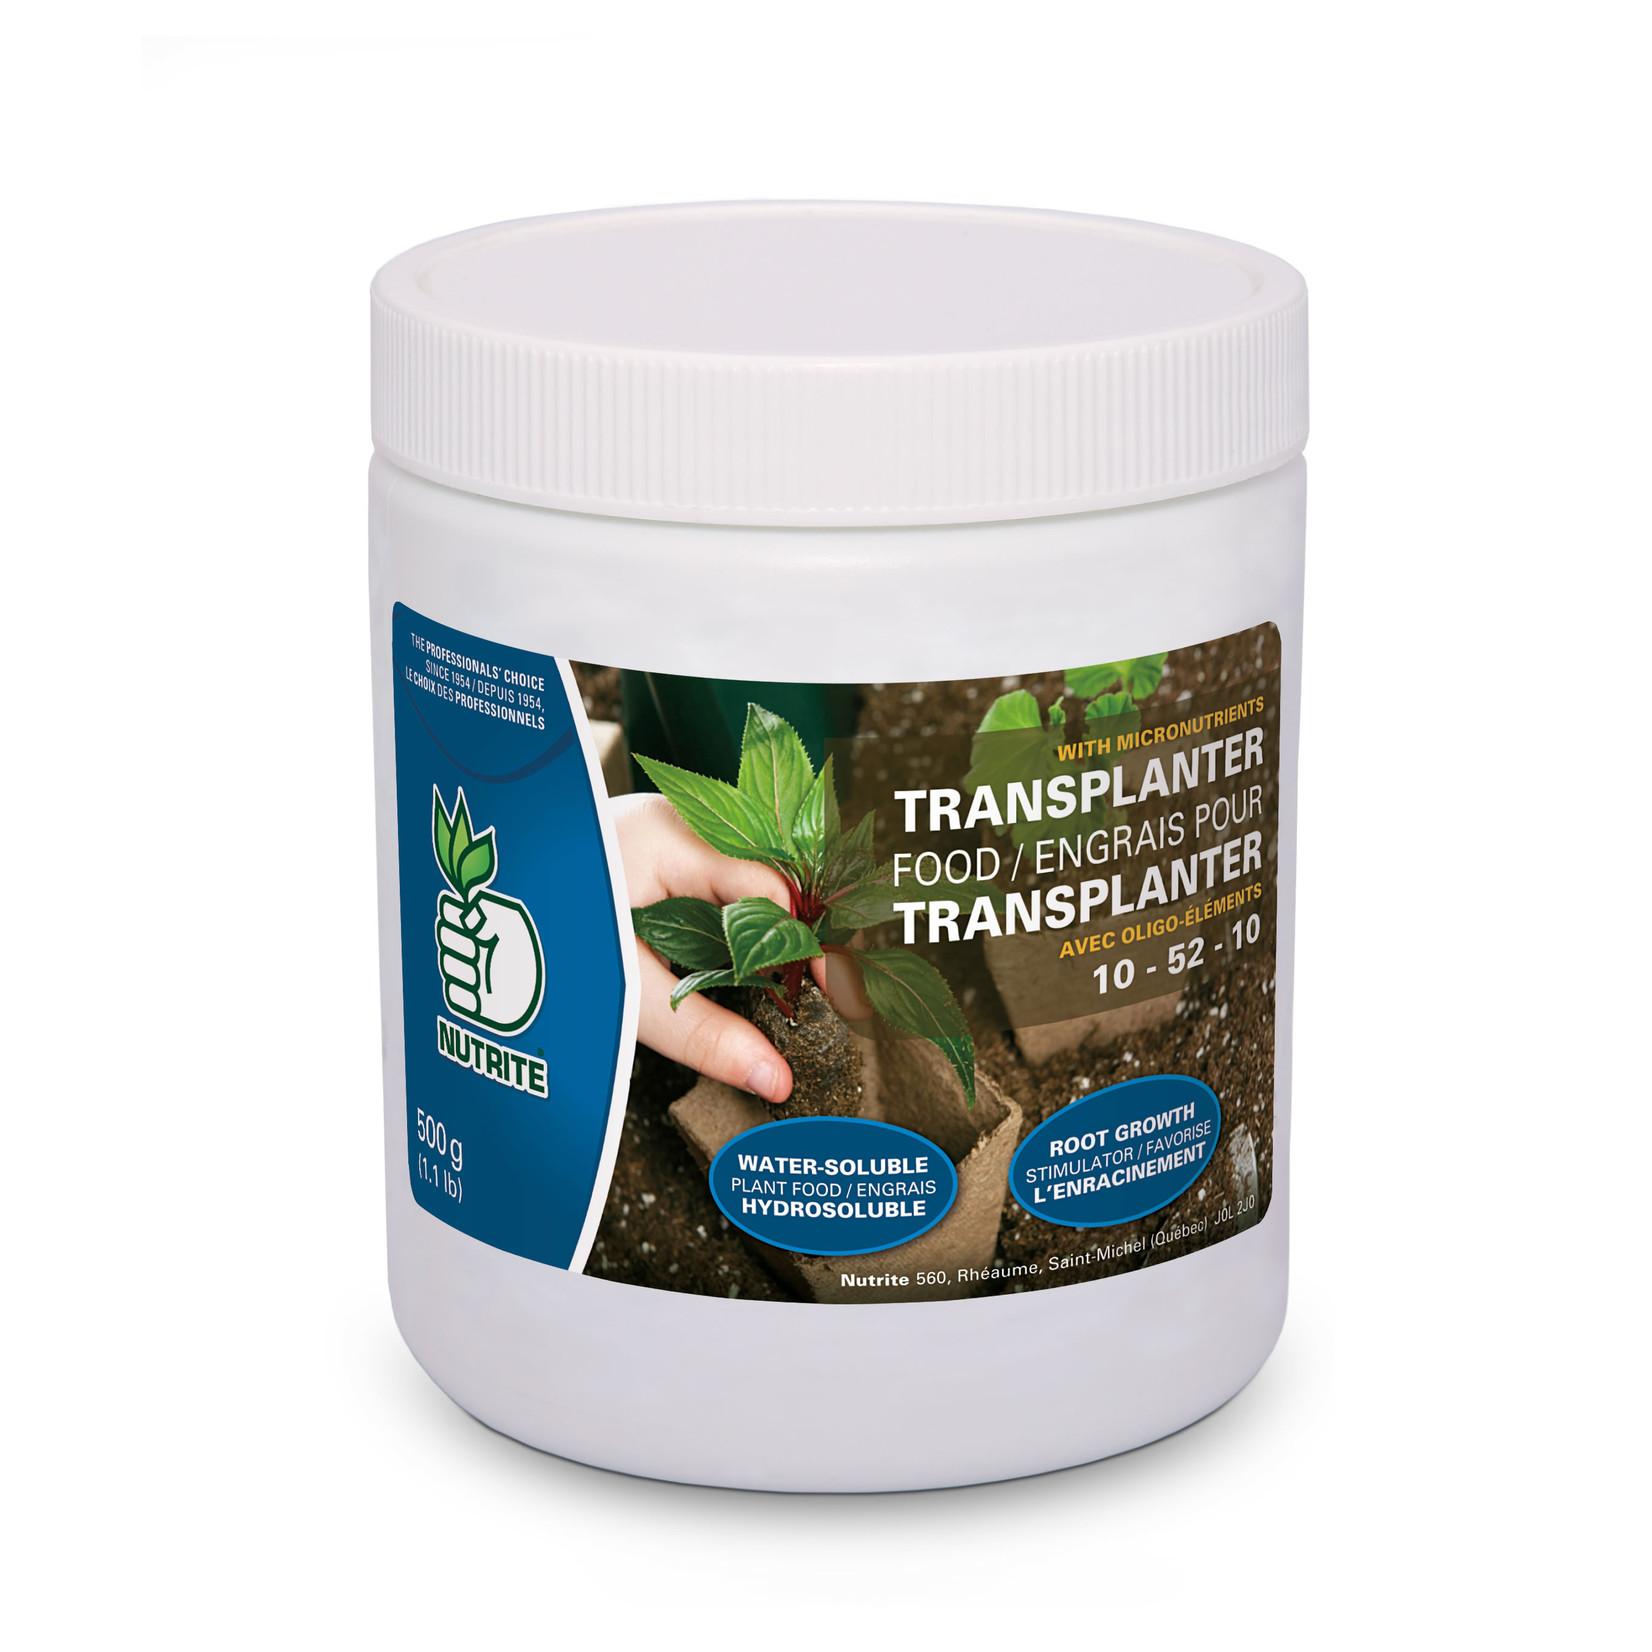 Nutrite Transplanter Food (10-52-10) 500g